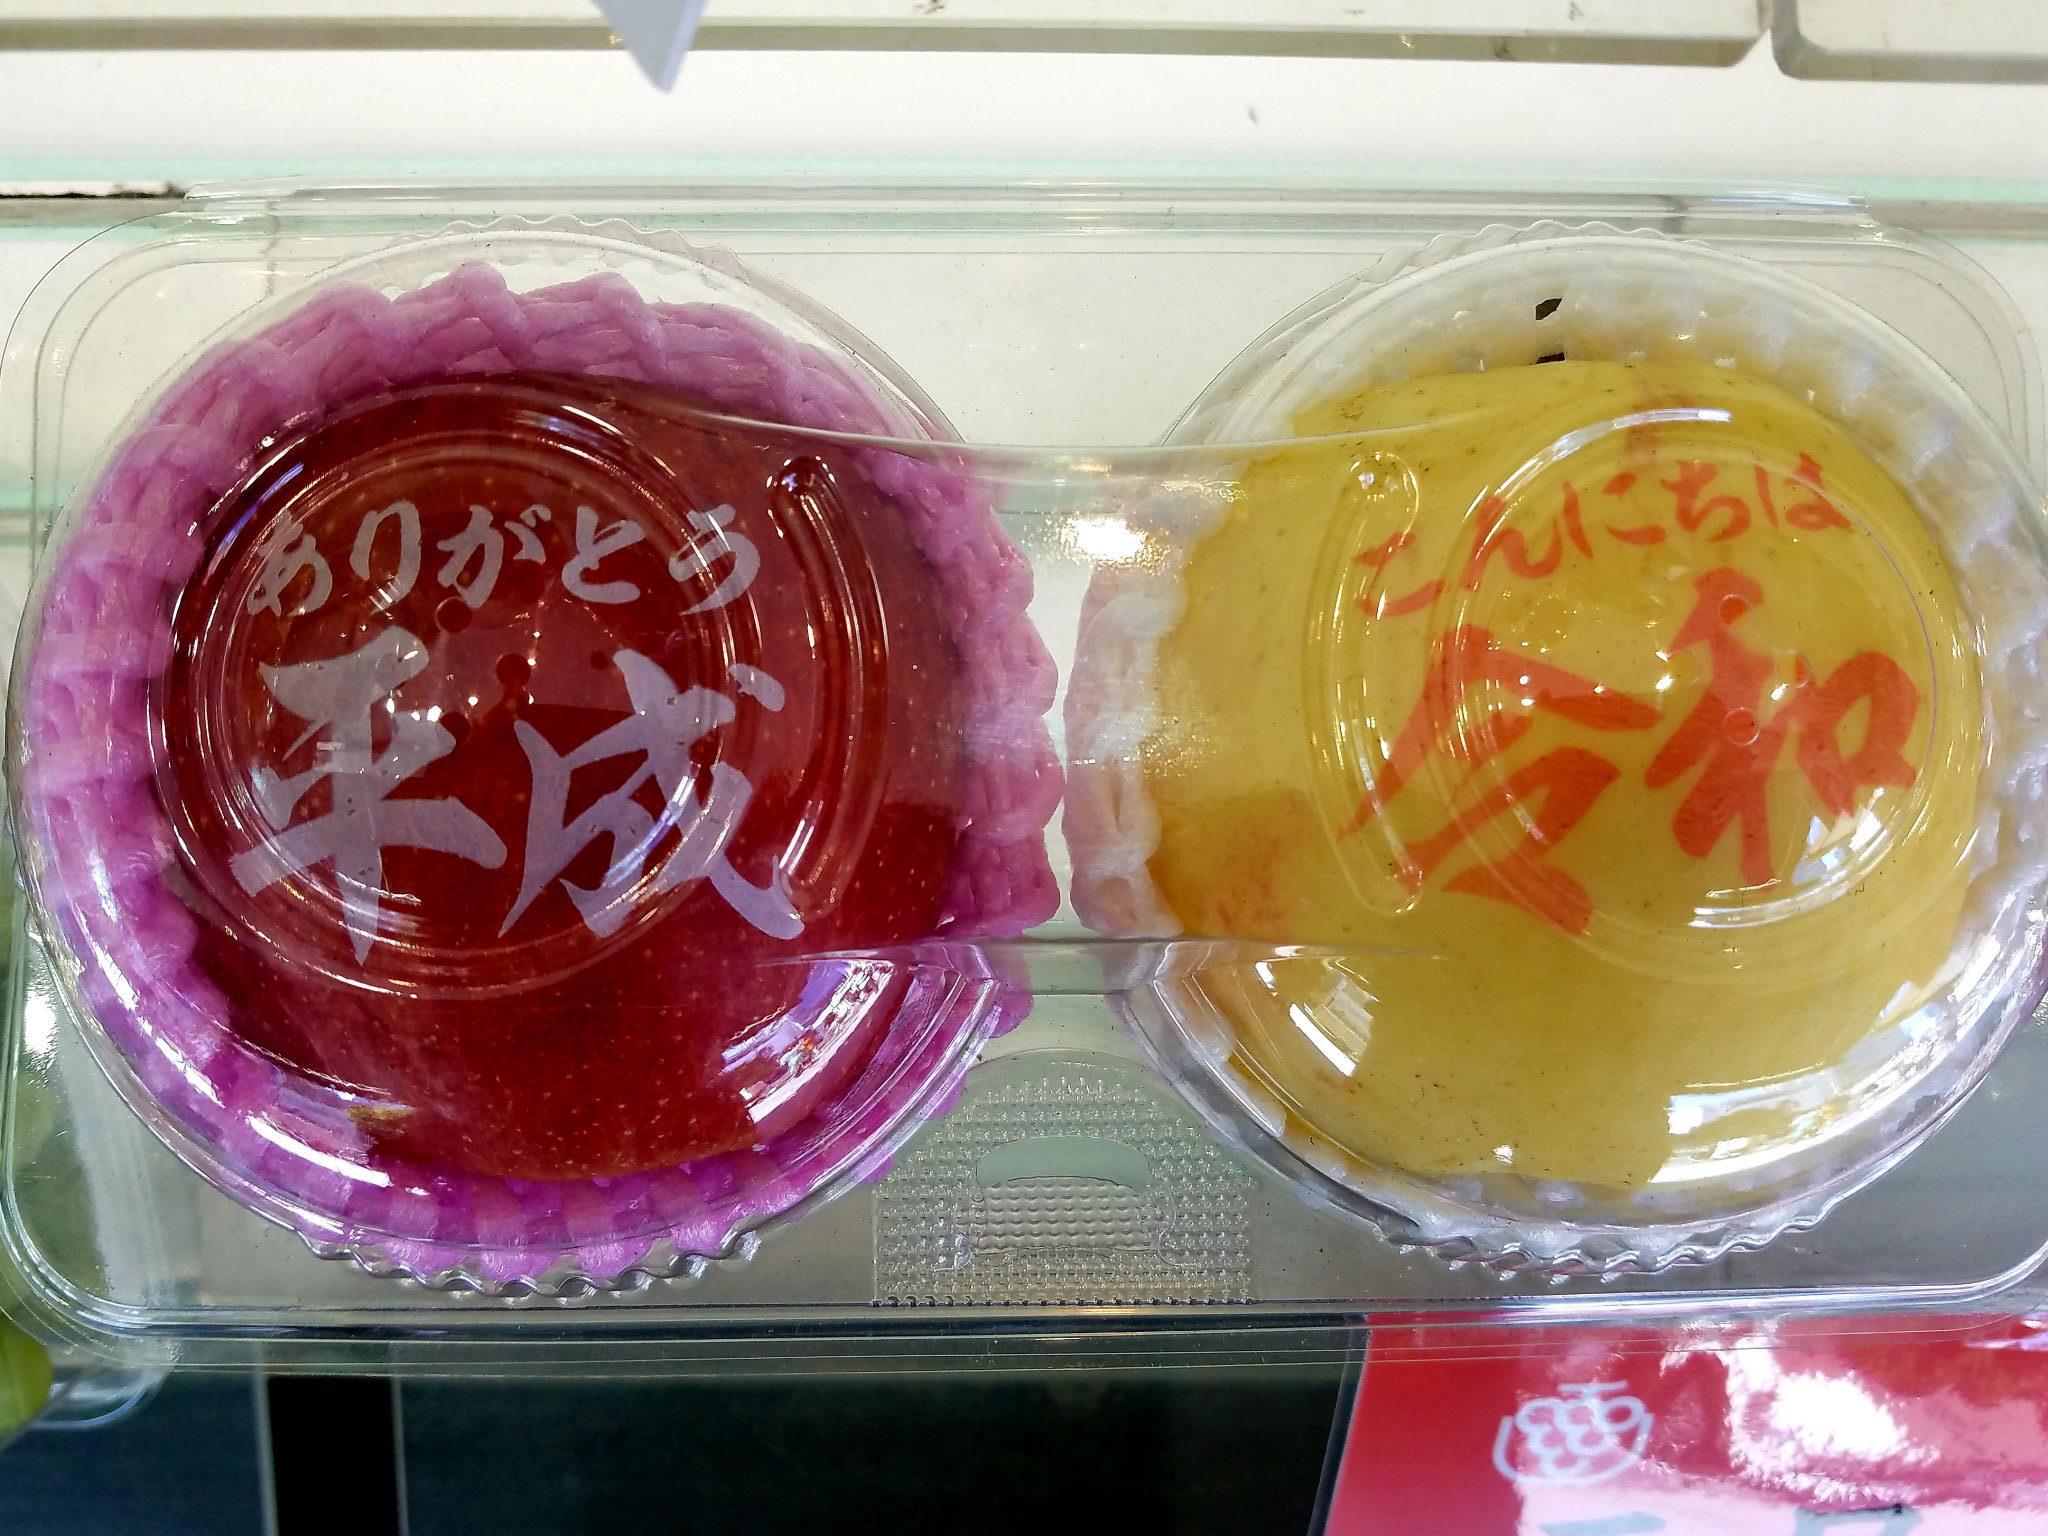 Arigatou Heisei, Konnichiwa Reiwa: Heisei and Reiwa Fuji apples